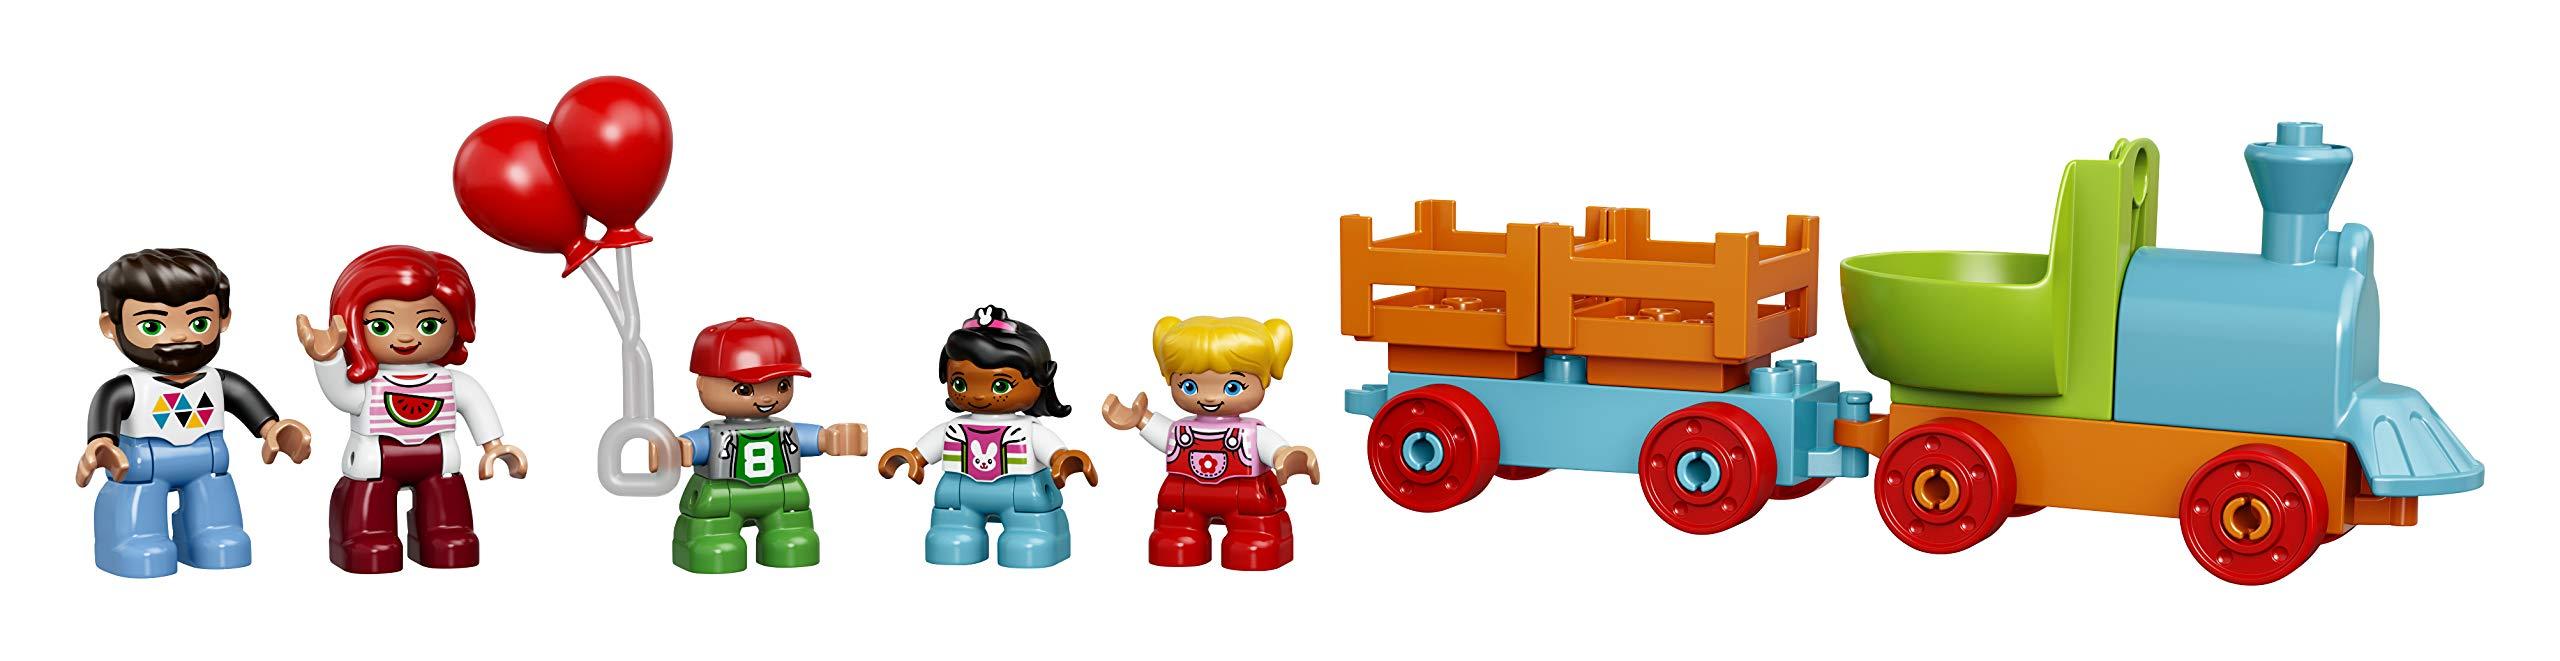 LEGO Duplo - Town il Grande Luna Park, 10840 4 spesavip